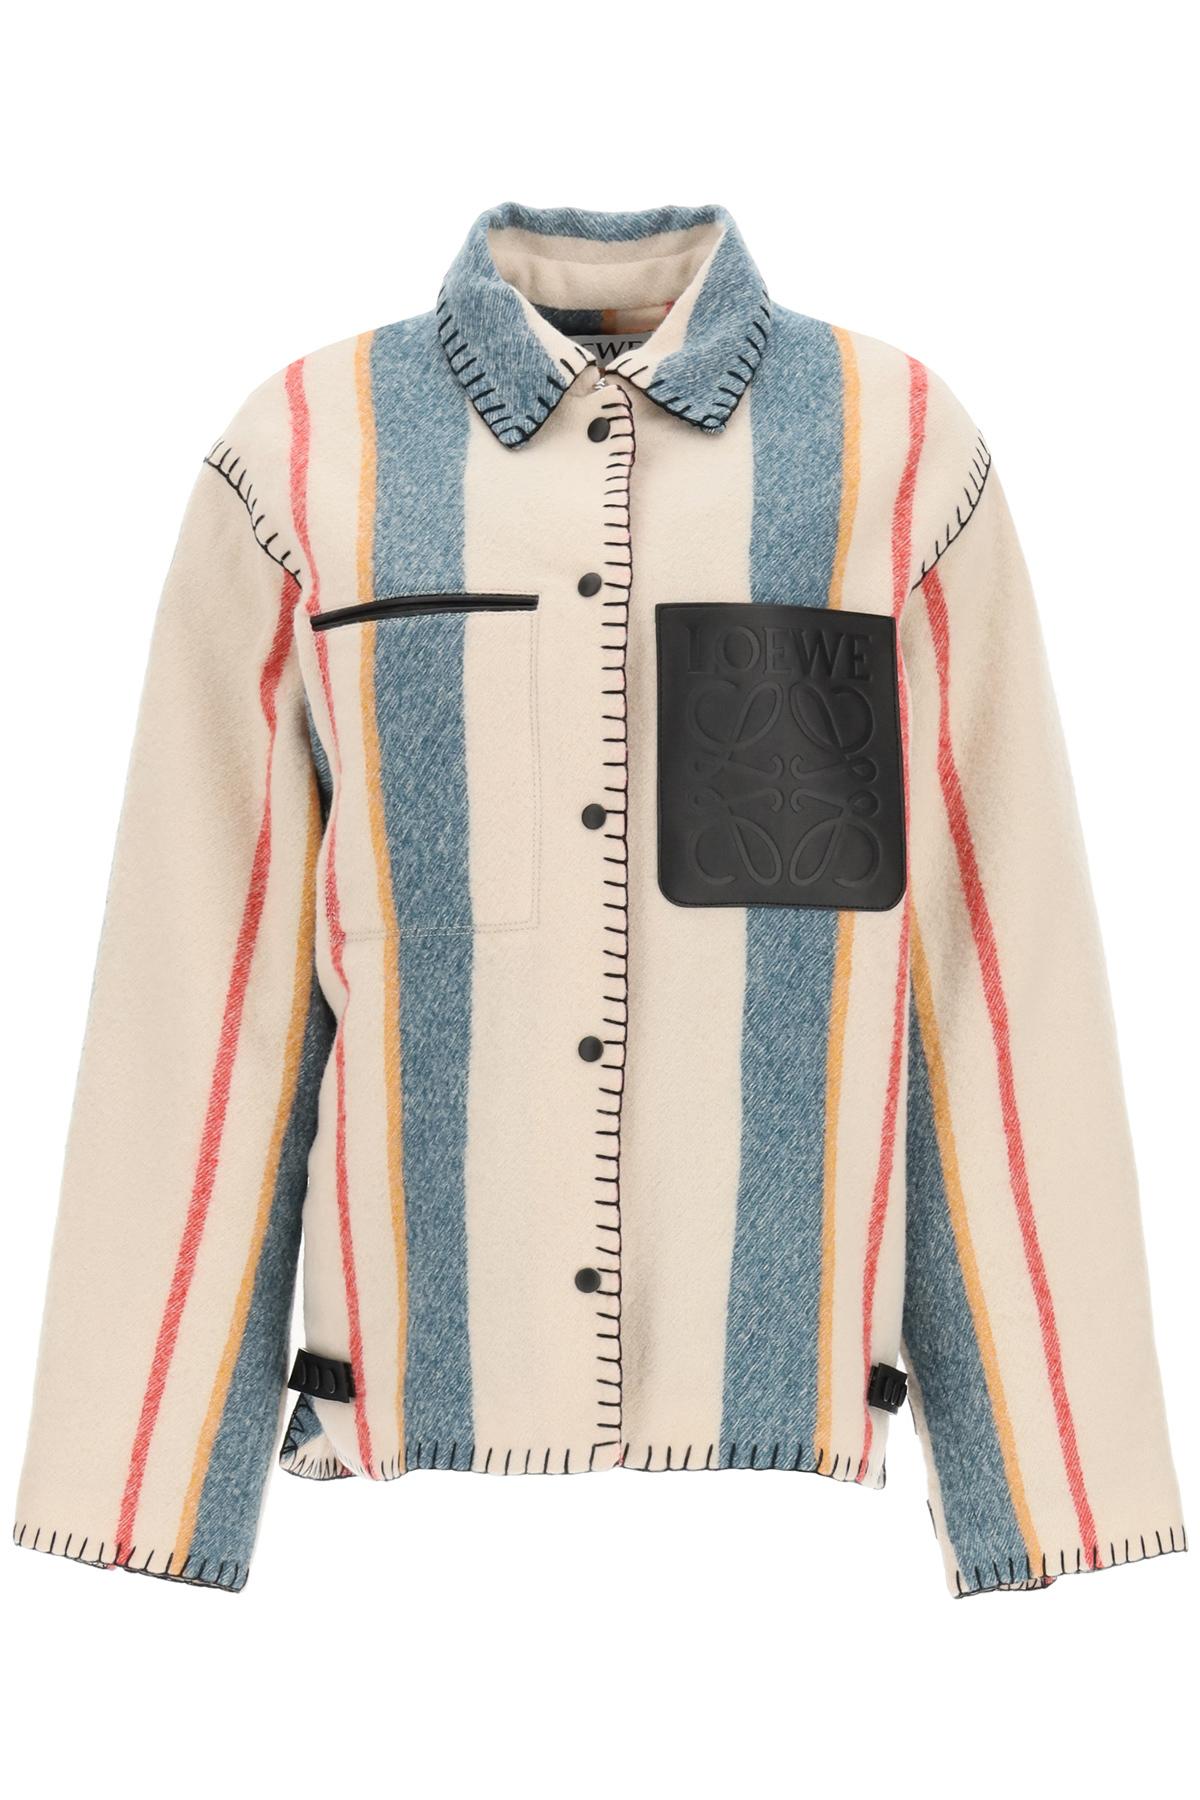 Loewe giacca in lana a righe